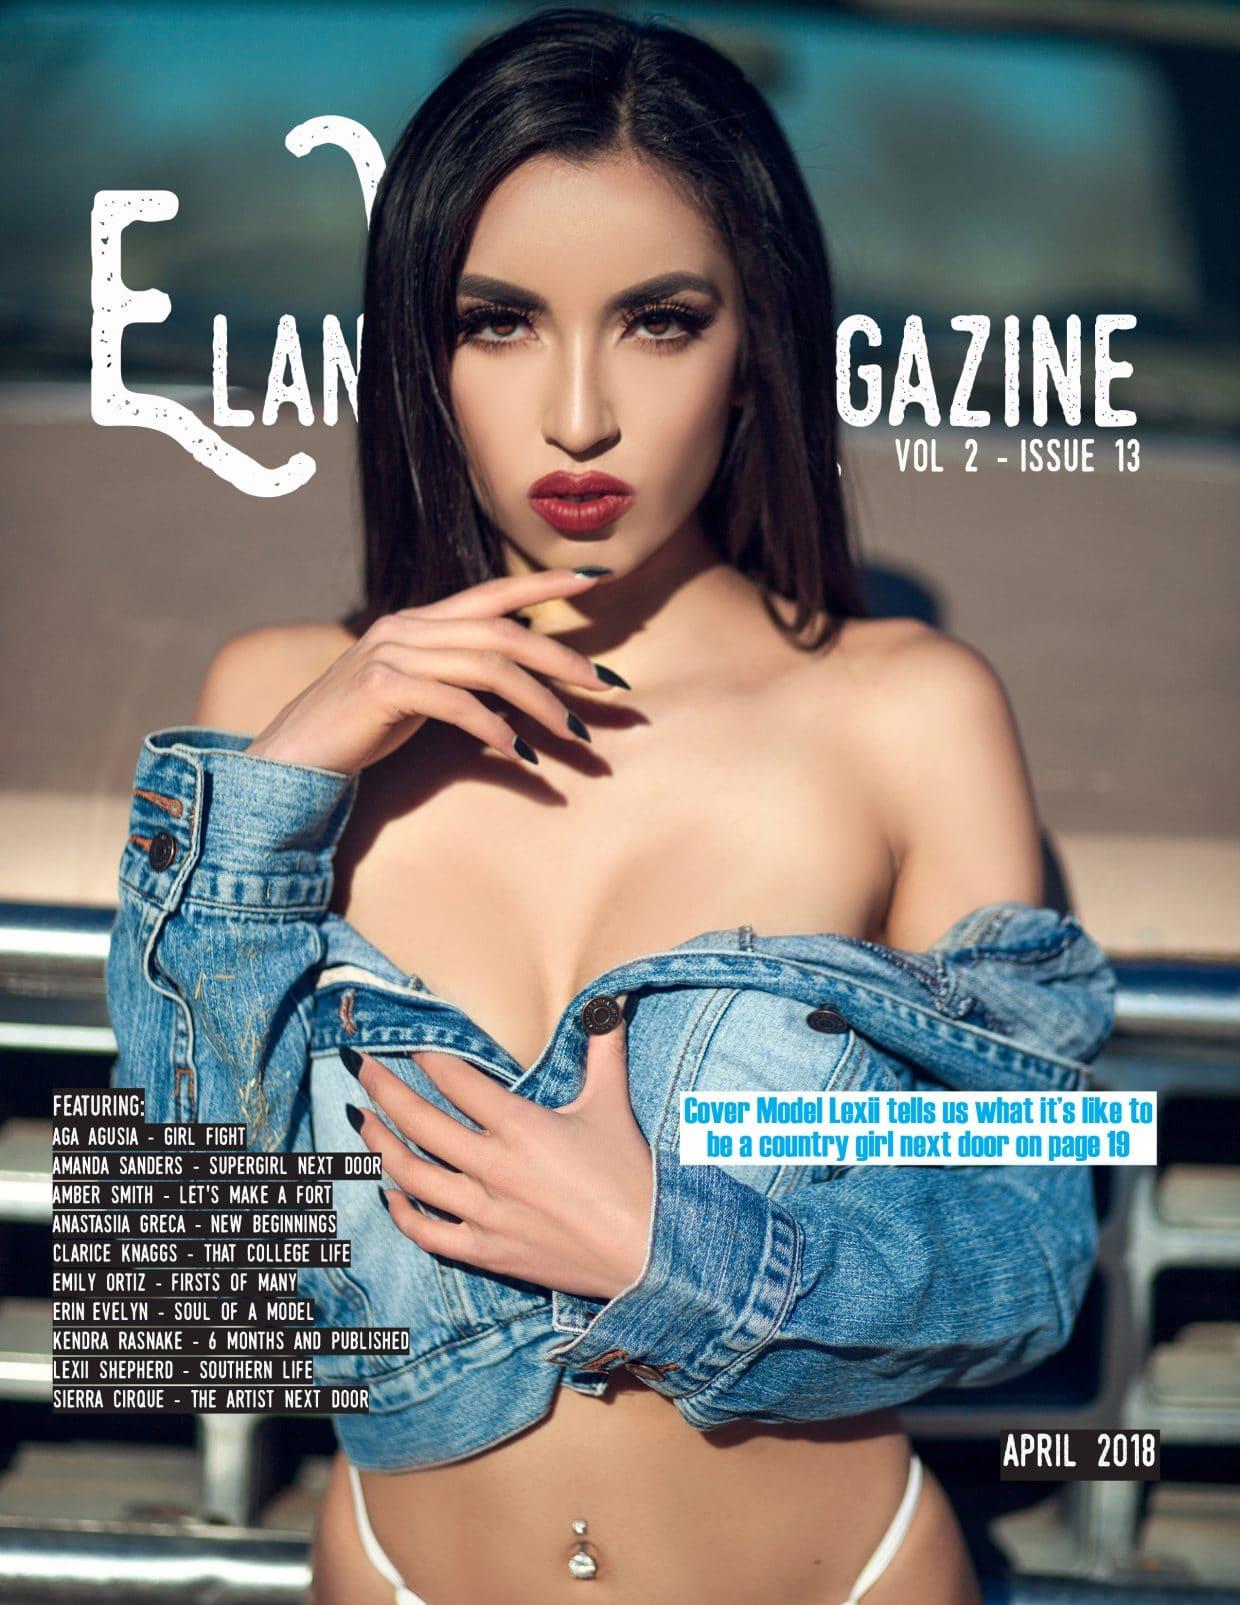 Elan Vital Magazine - April 2018 - Lexii Shepherd 1